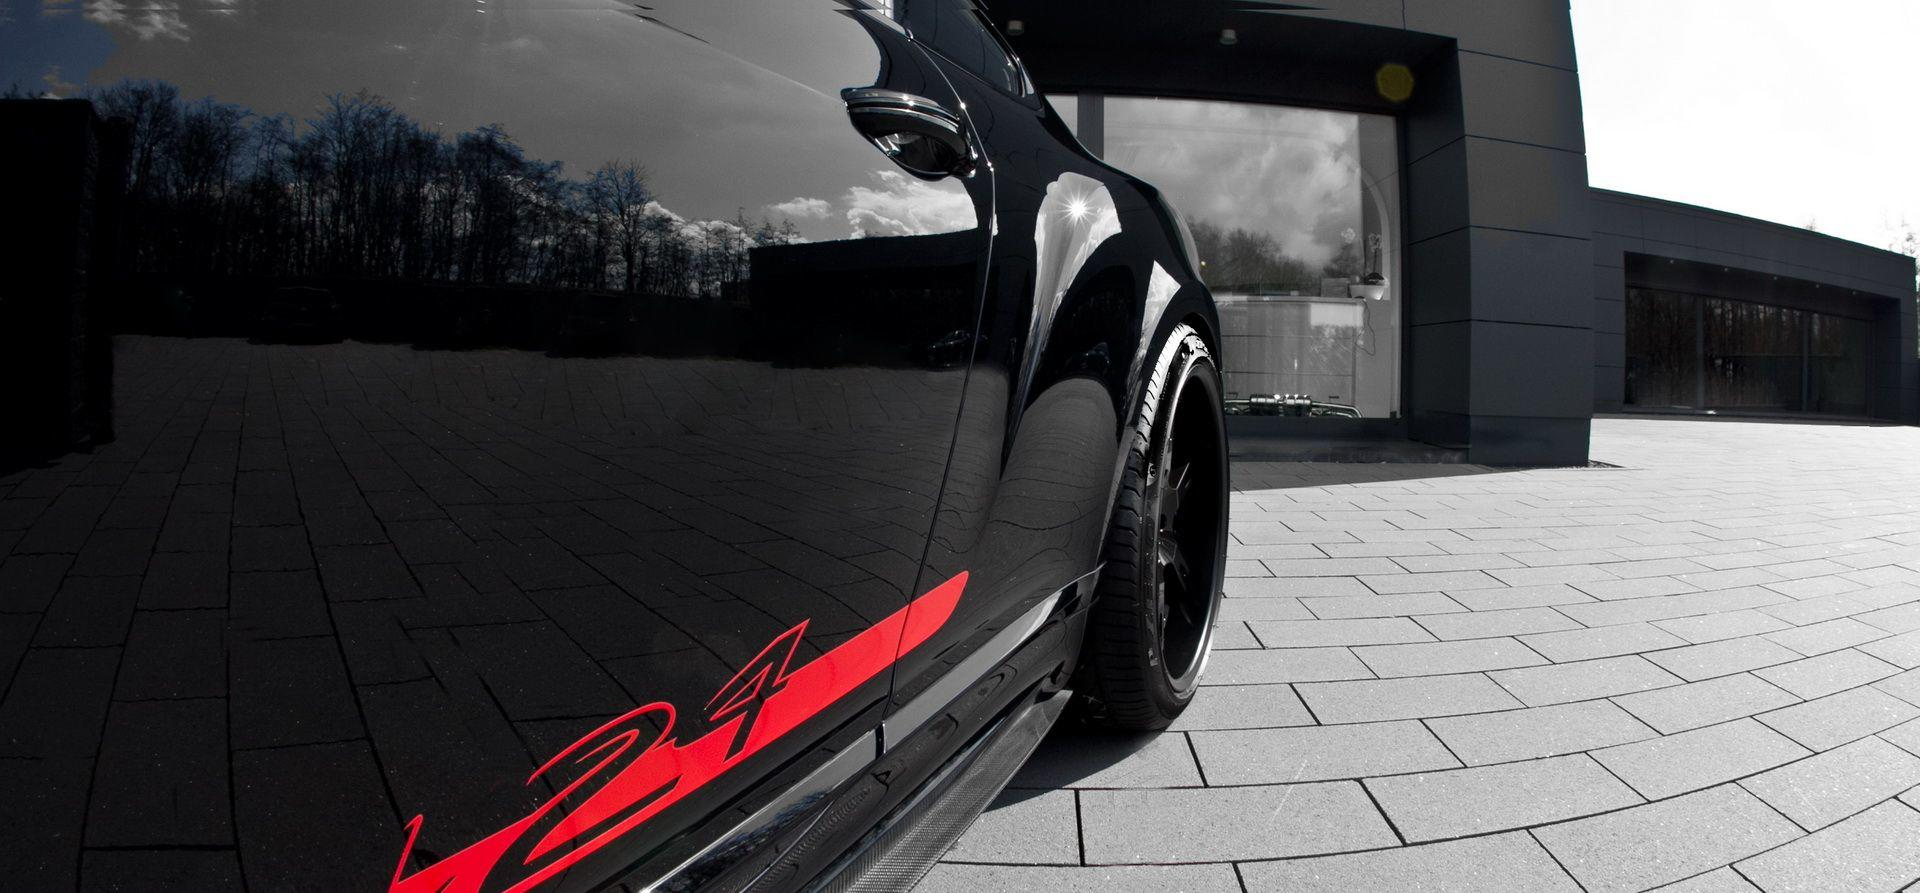 Bentley Continental 24 by Wheelsandmore - Bentley Continental 24 by Wheelsandmore